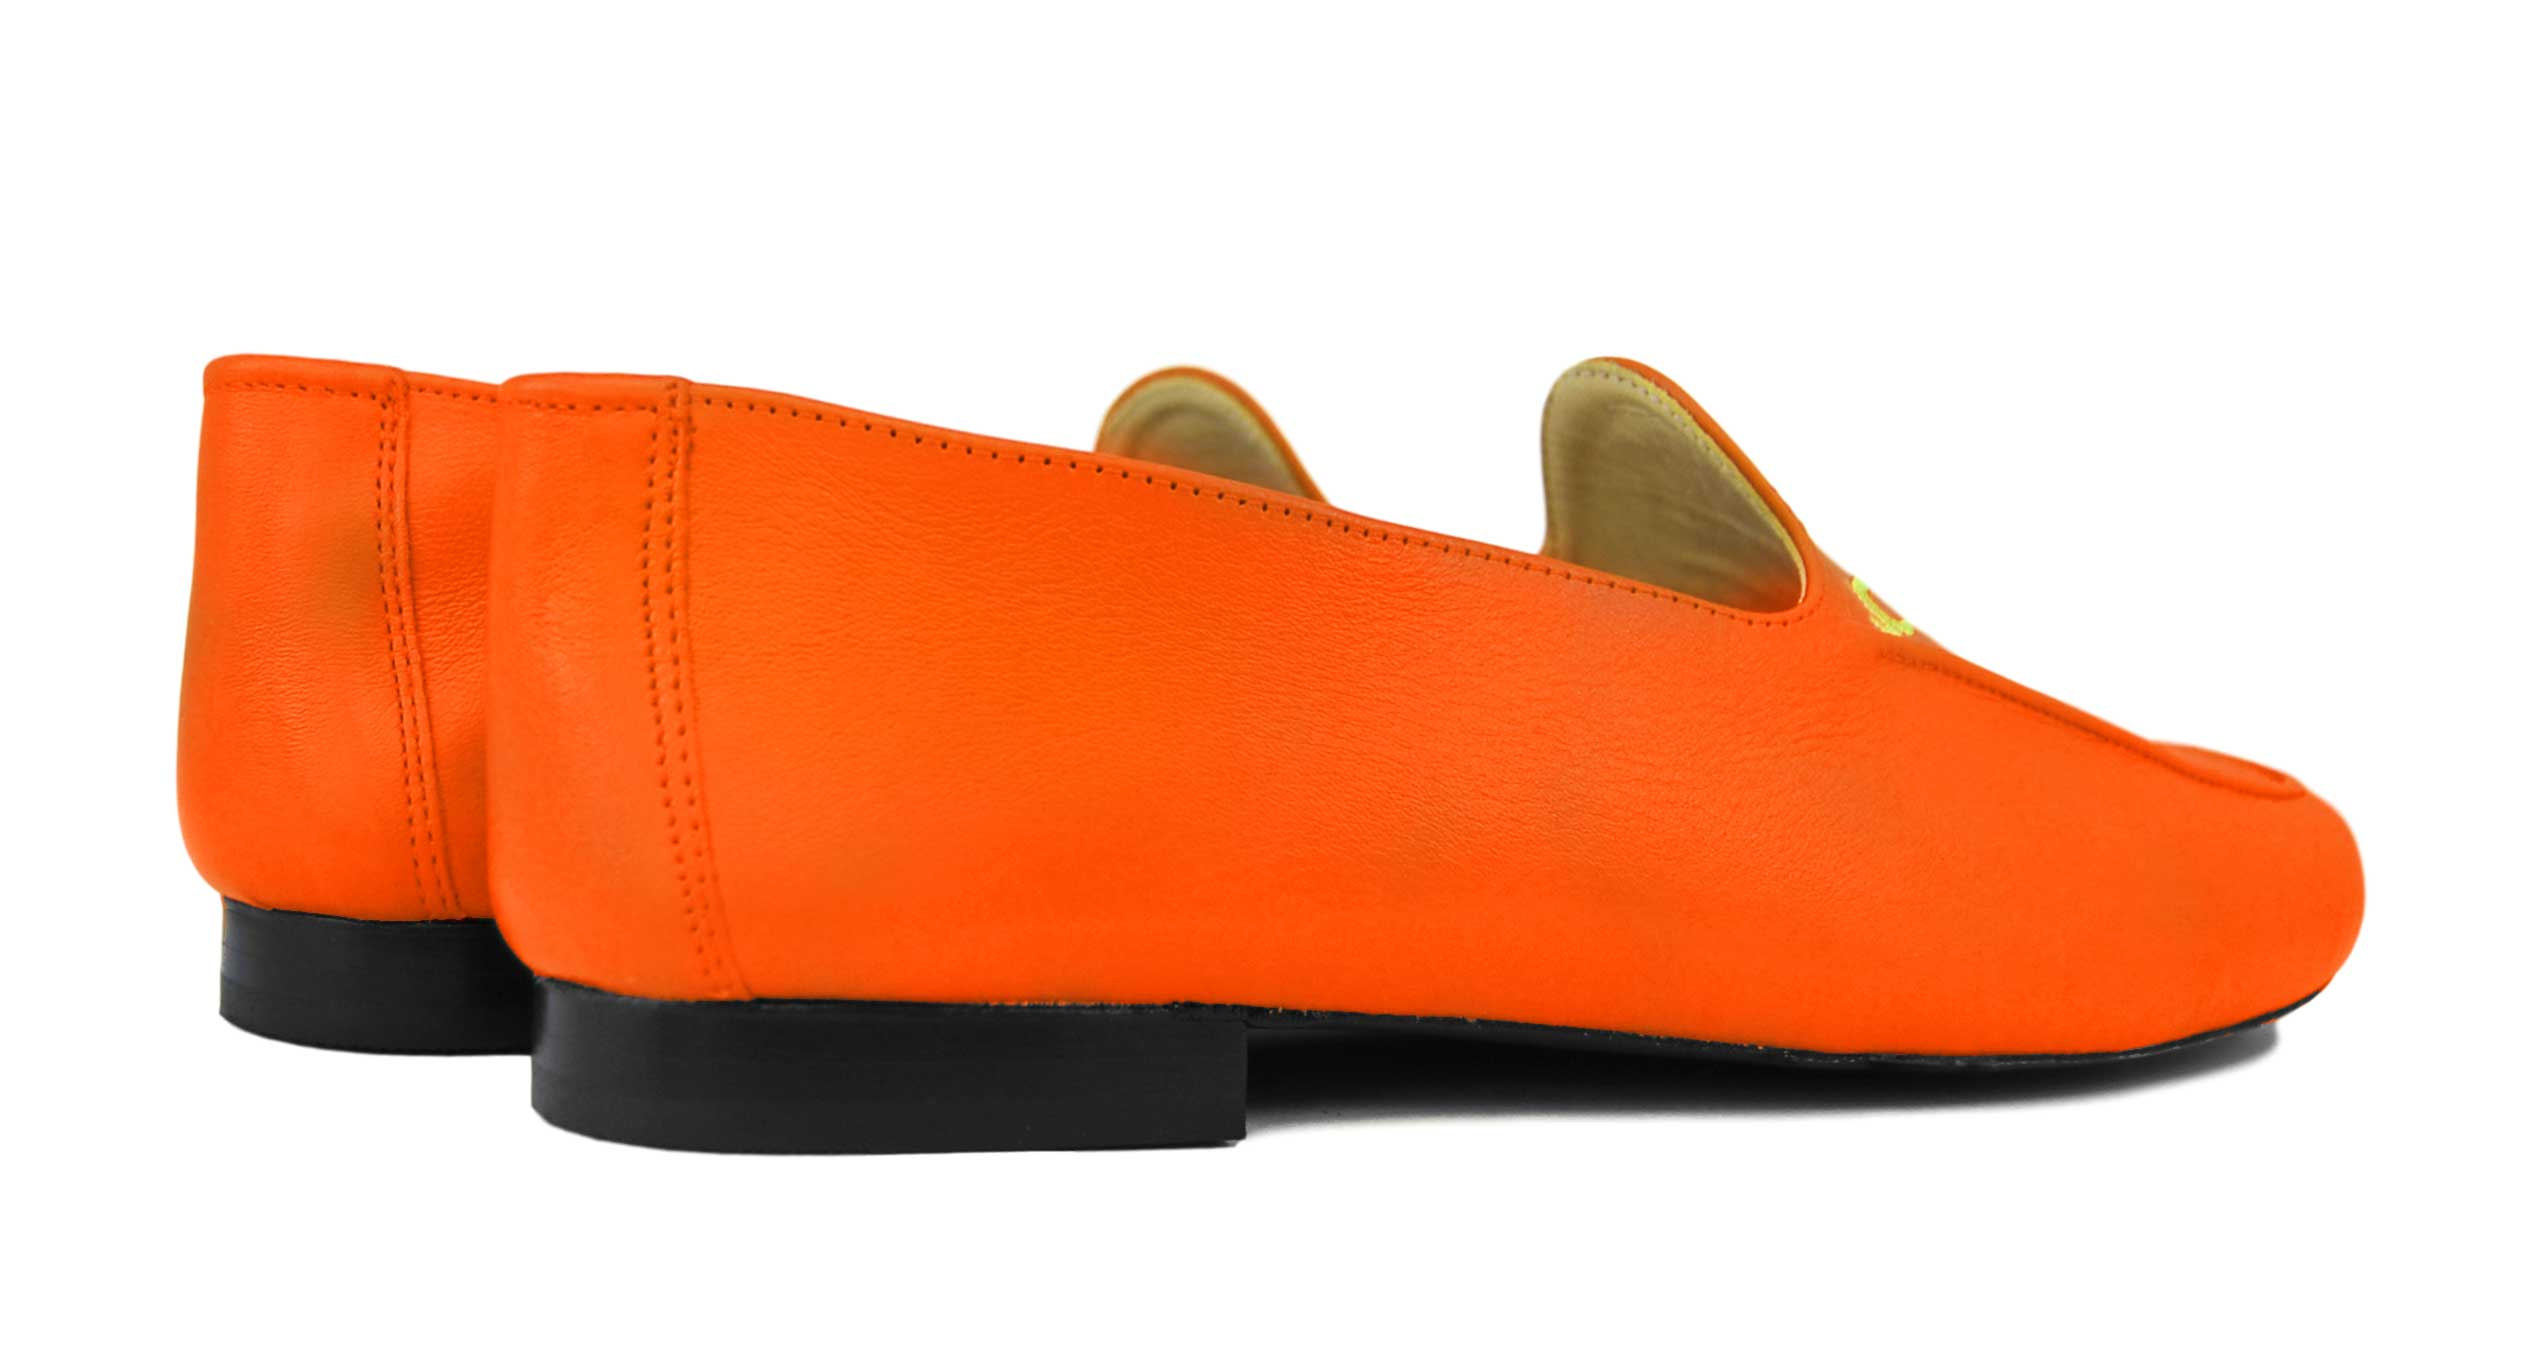 Foto 4 de Zapatos Julio Iglesias Mocasin 528 JC Naranja Napa